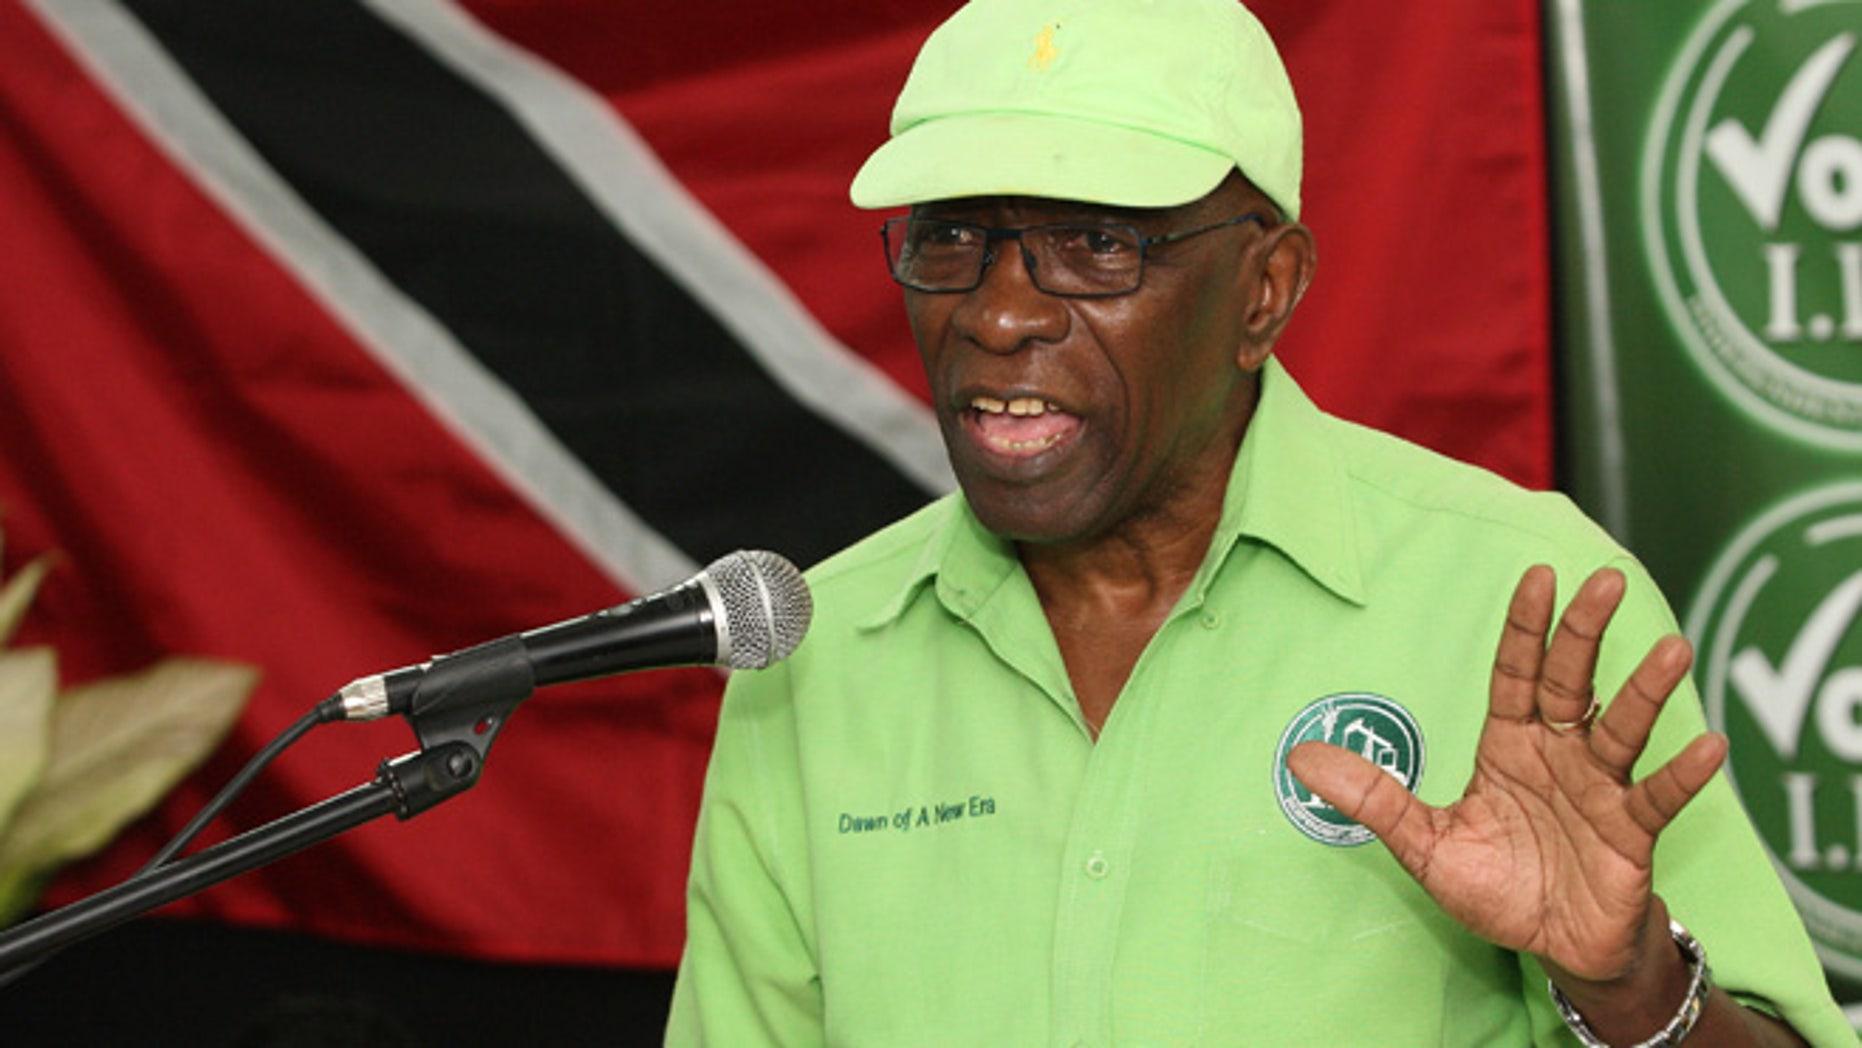 June 3, 2015: Former FIFA vice president Jack Warner speaks at a political rally in Marabella, Trinidad and Tobago.